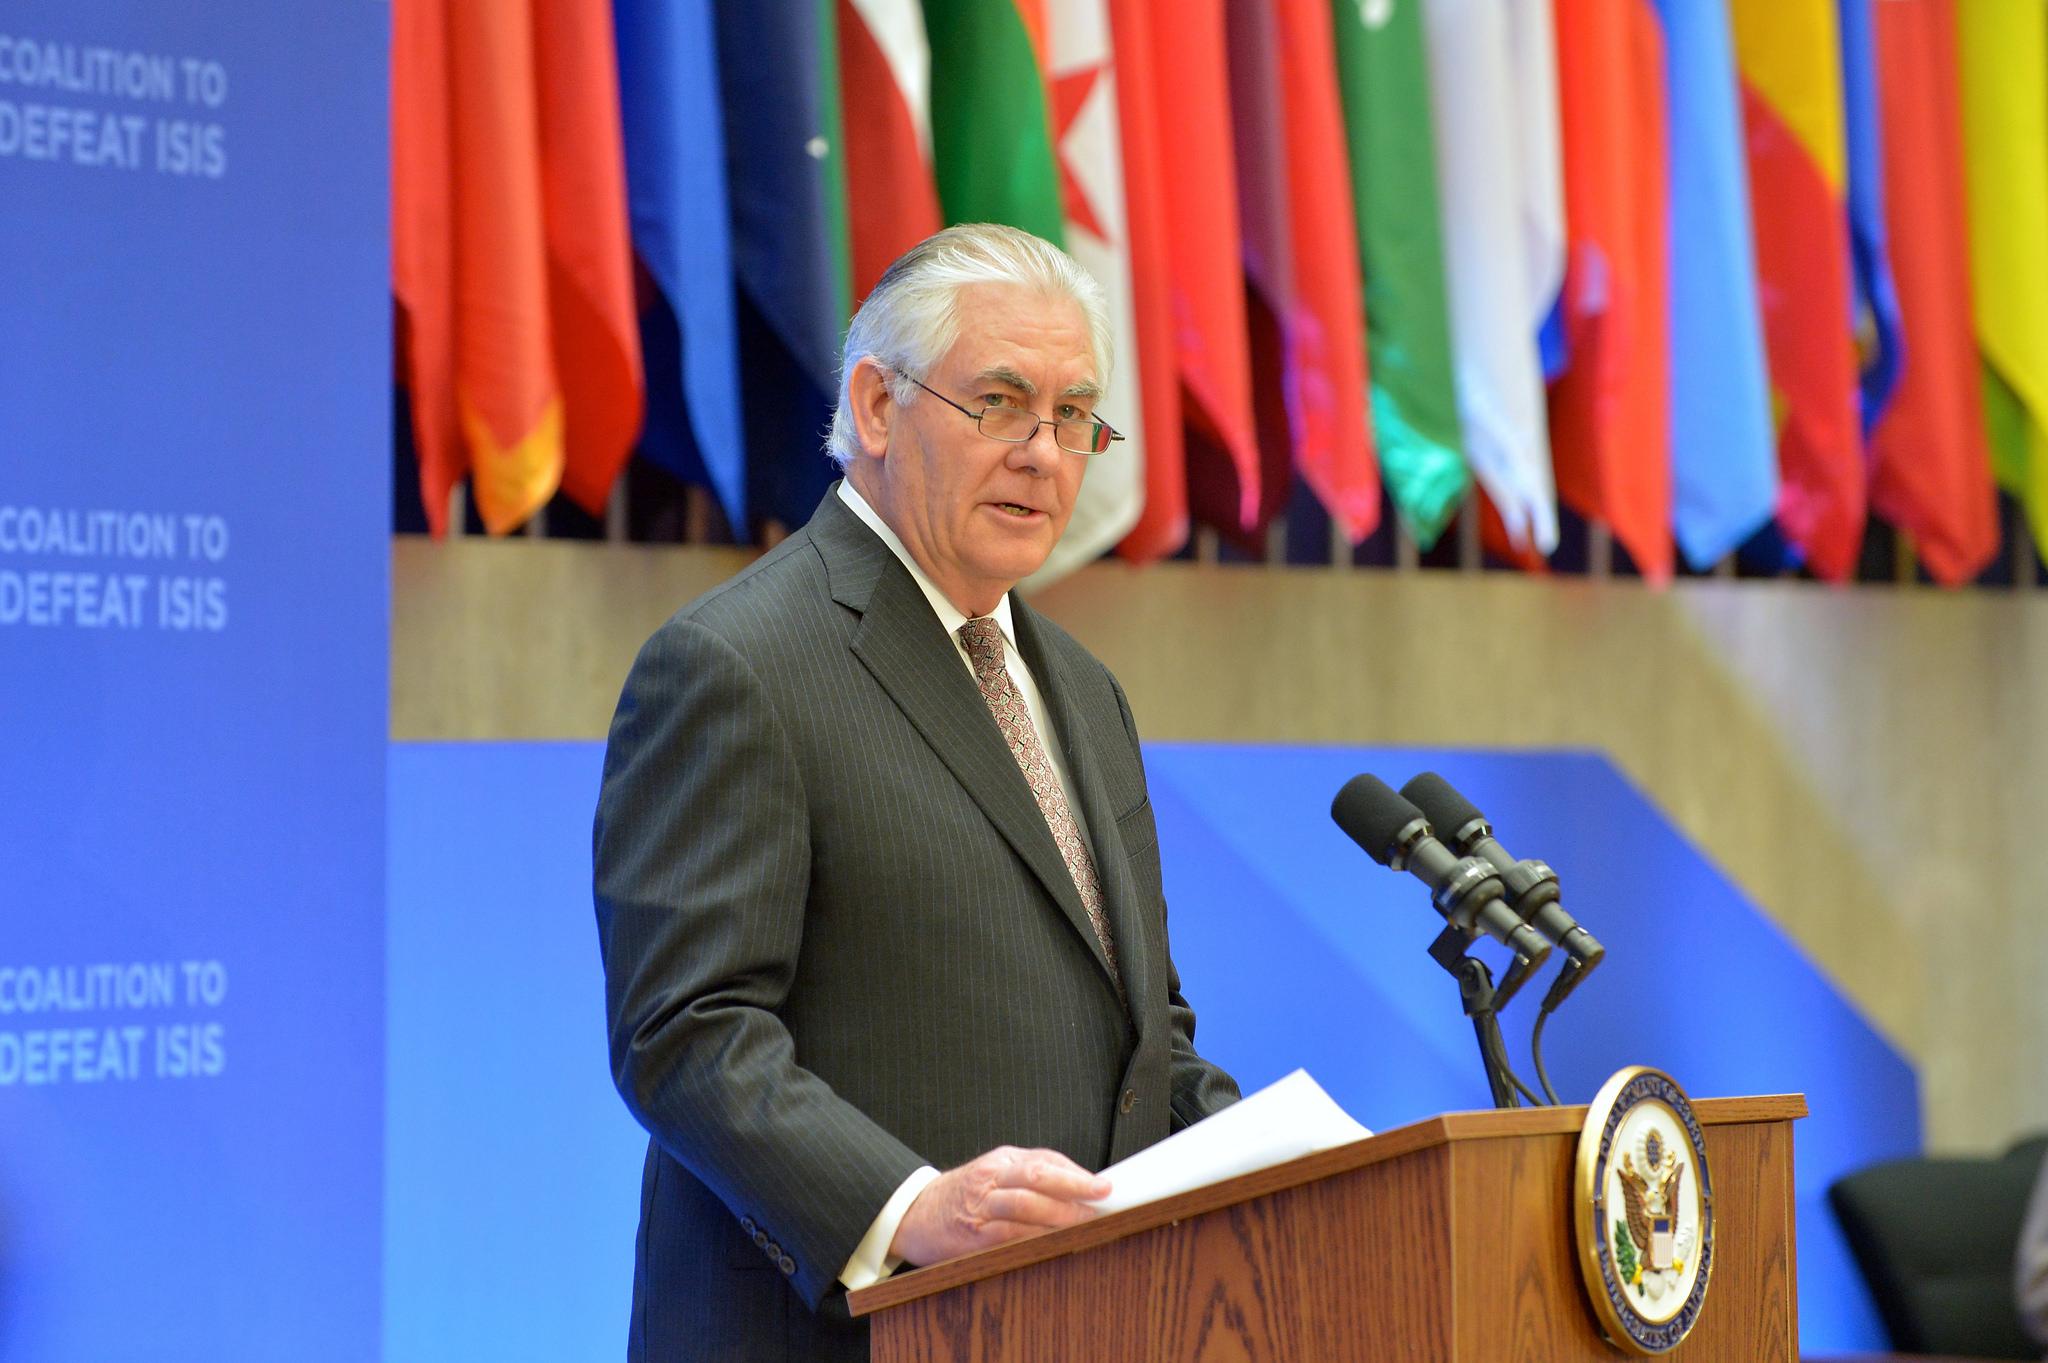 Tillerson Condemns Hate Speech, Says Bigotry is Un-American